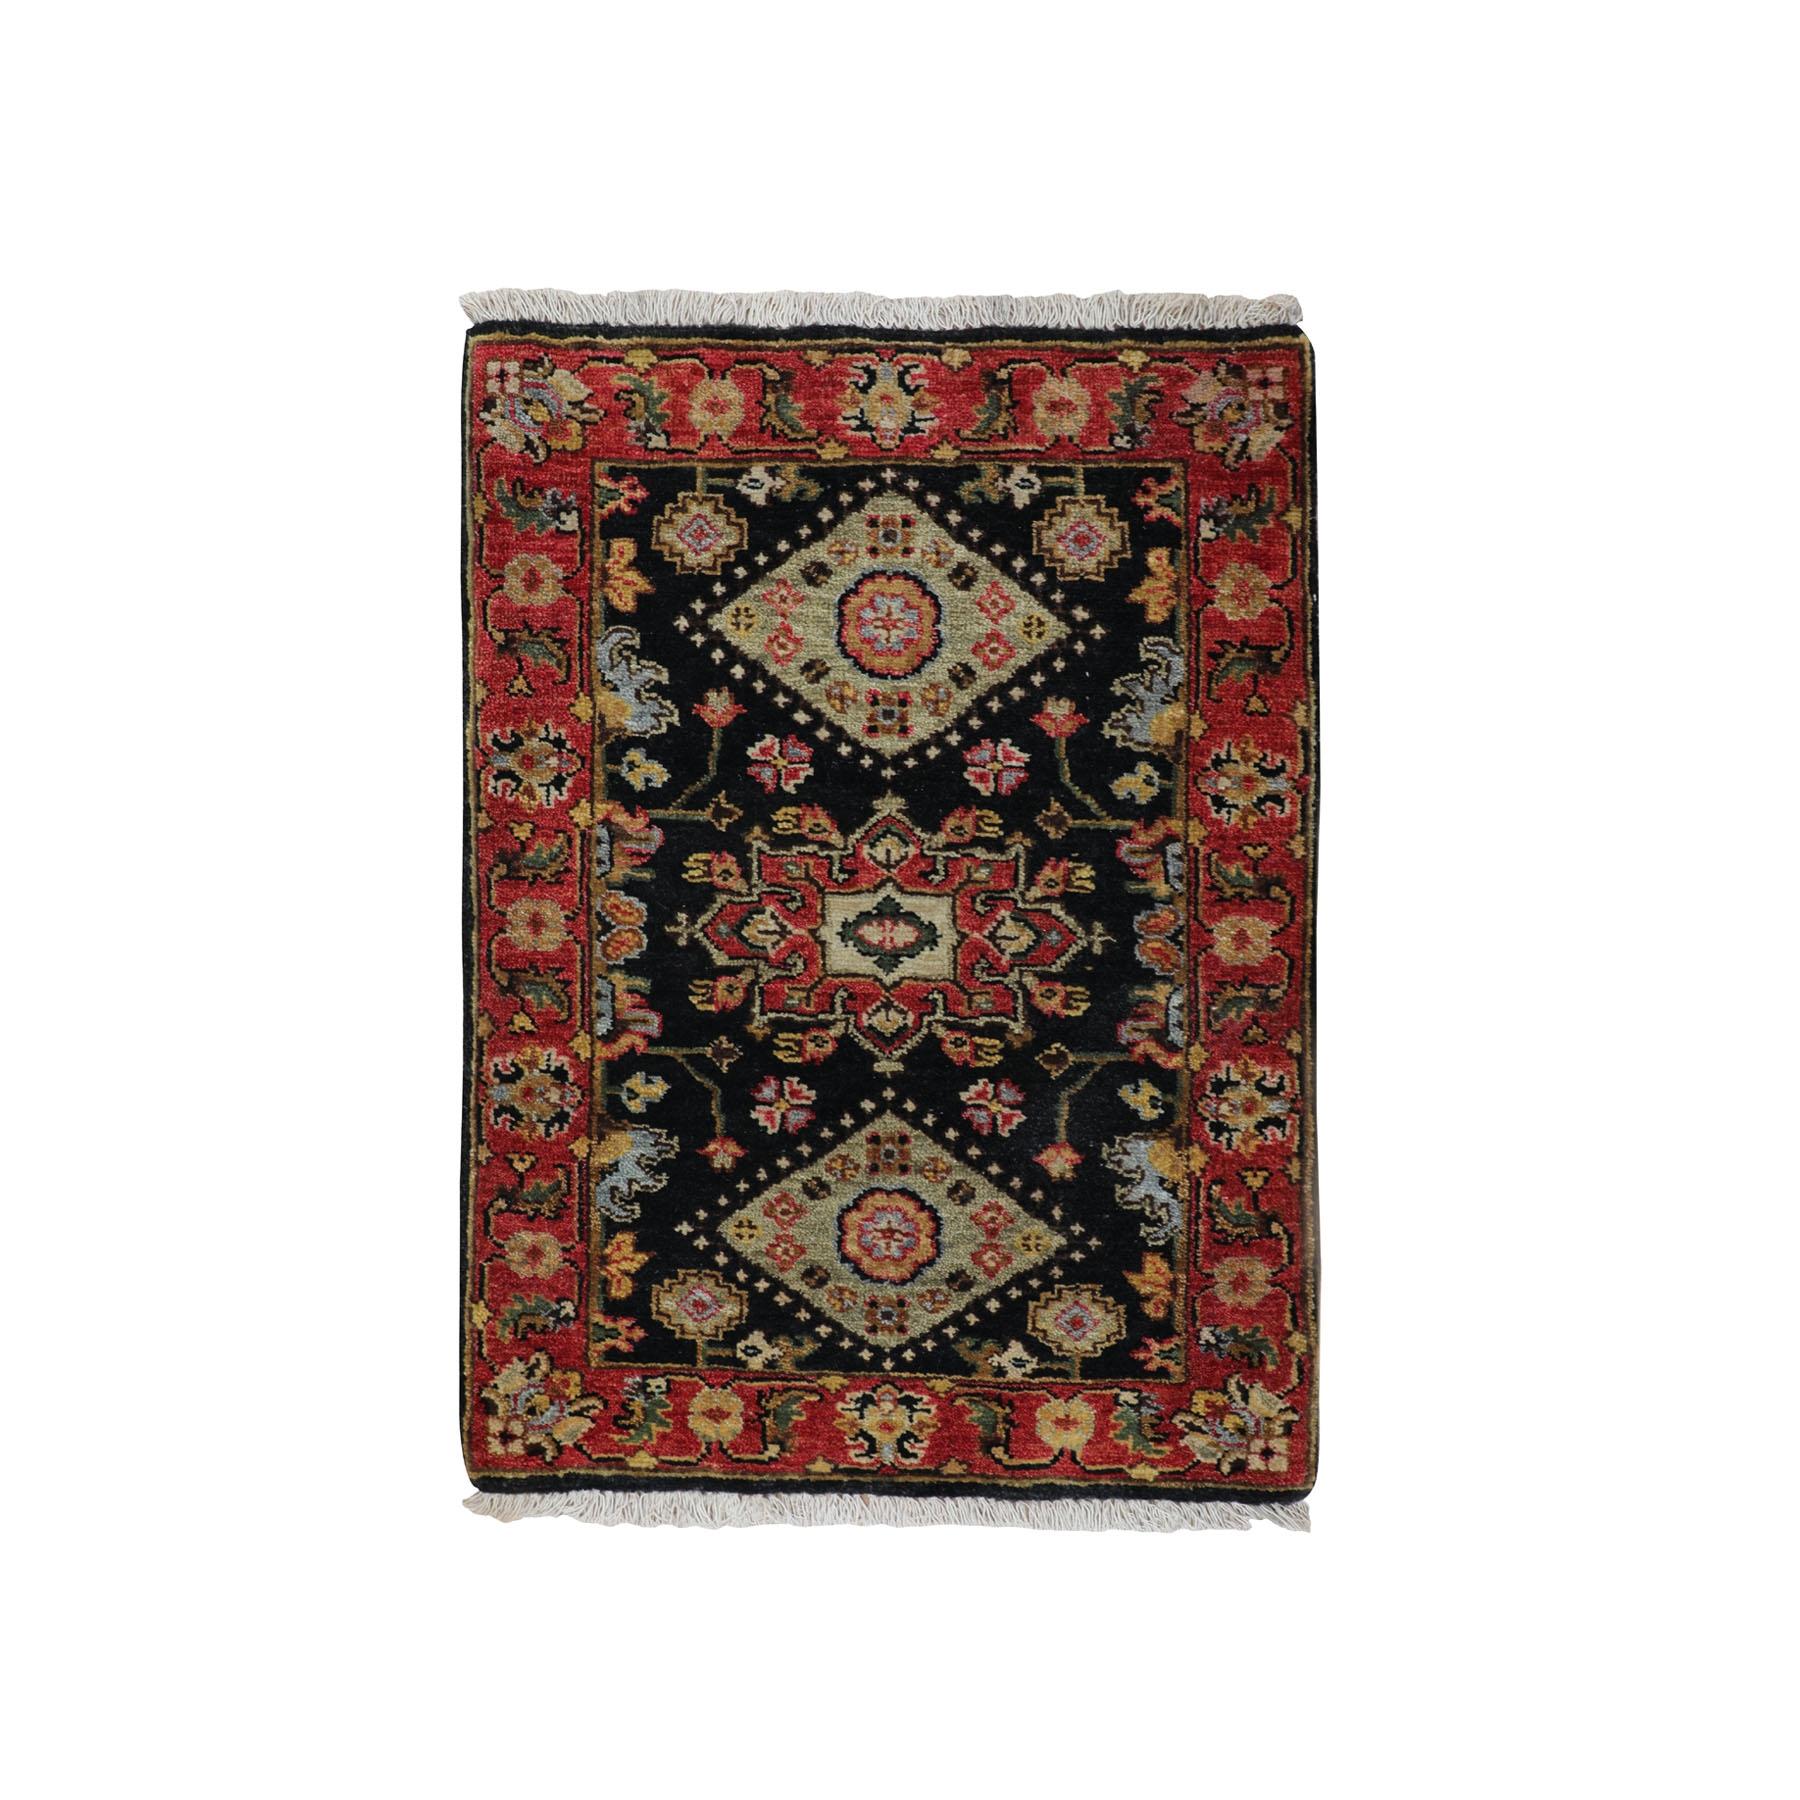 "2'1""x3' Black Karajeh Design Hand Knotted Pure Wool Oriental Rug"